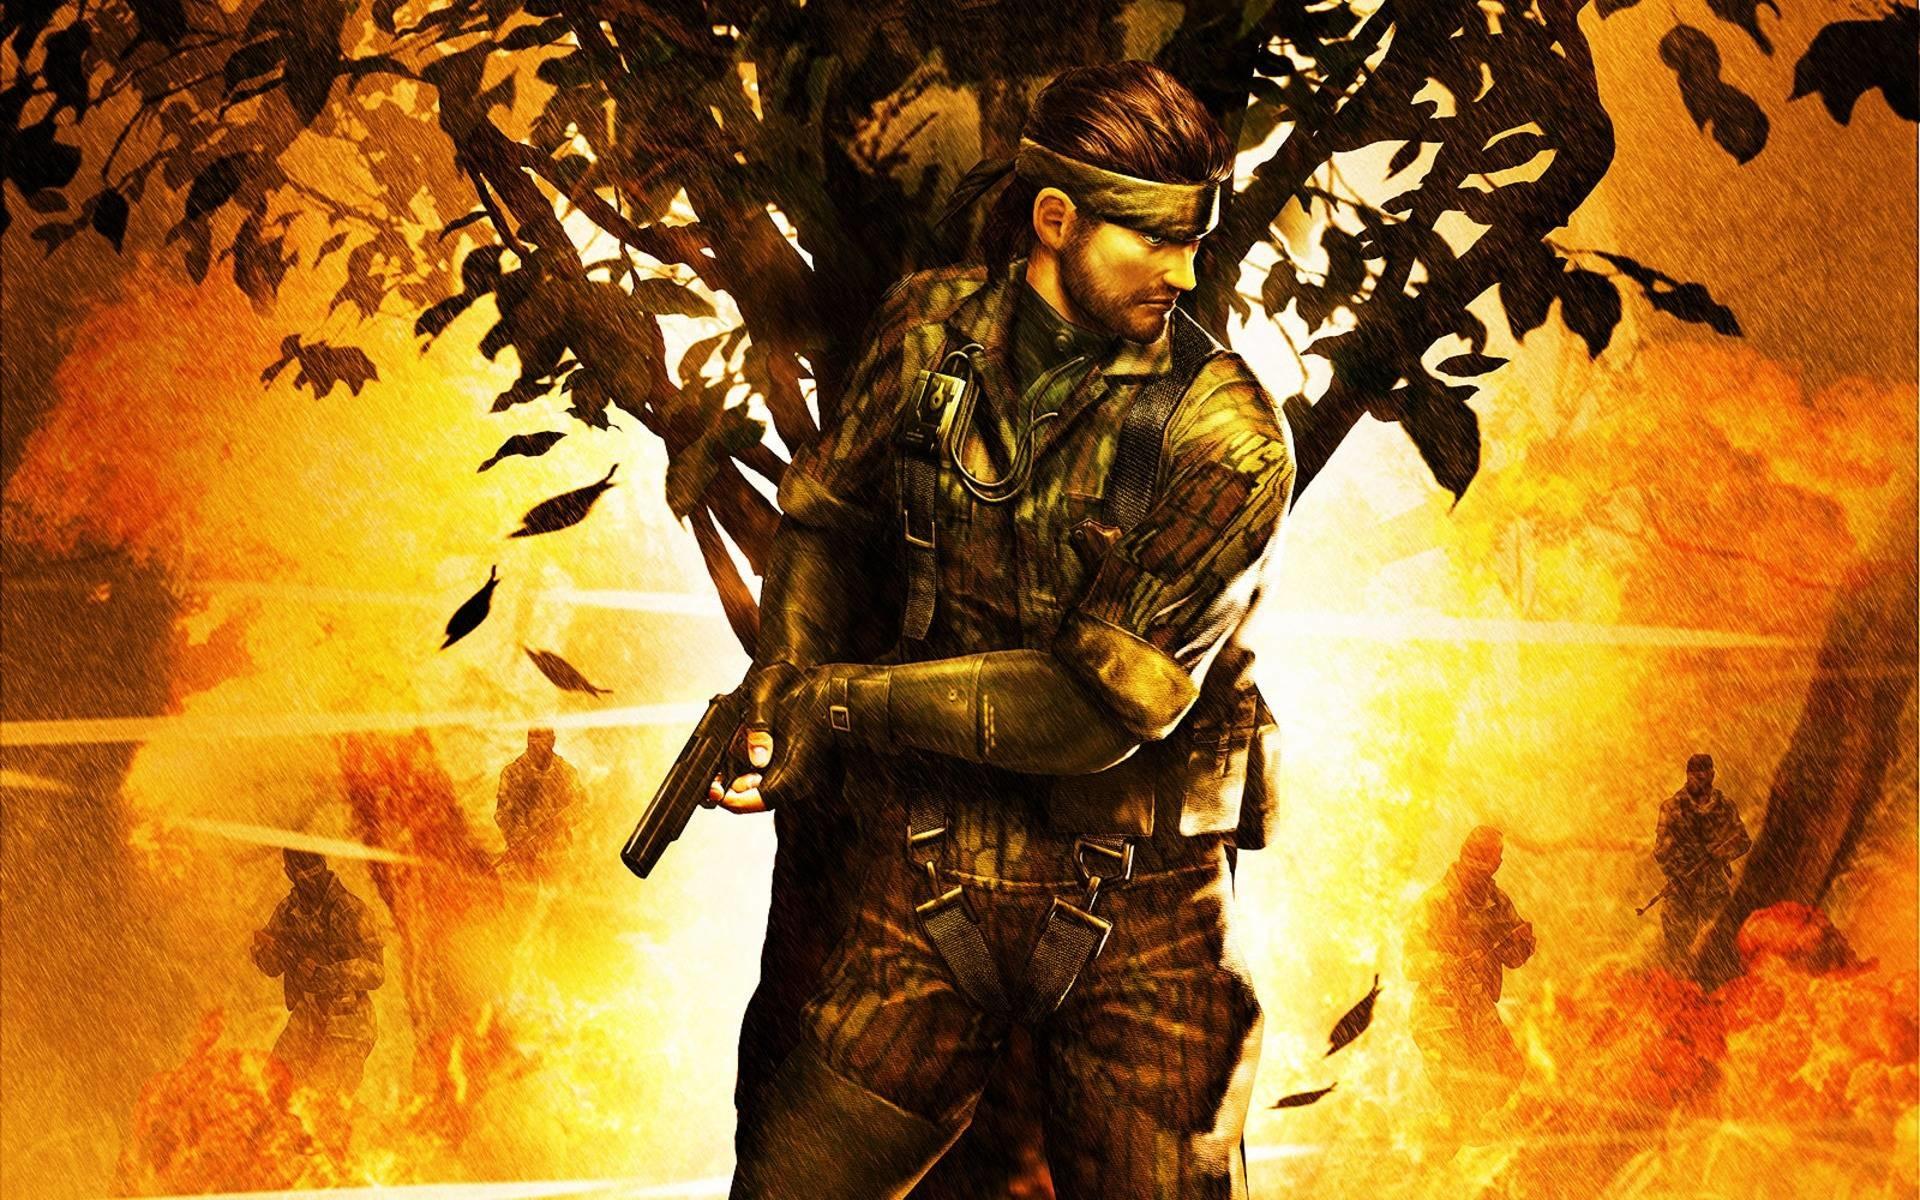 Metal Gear Solid Wallpaper 1080p (76+ images)